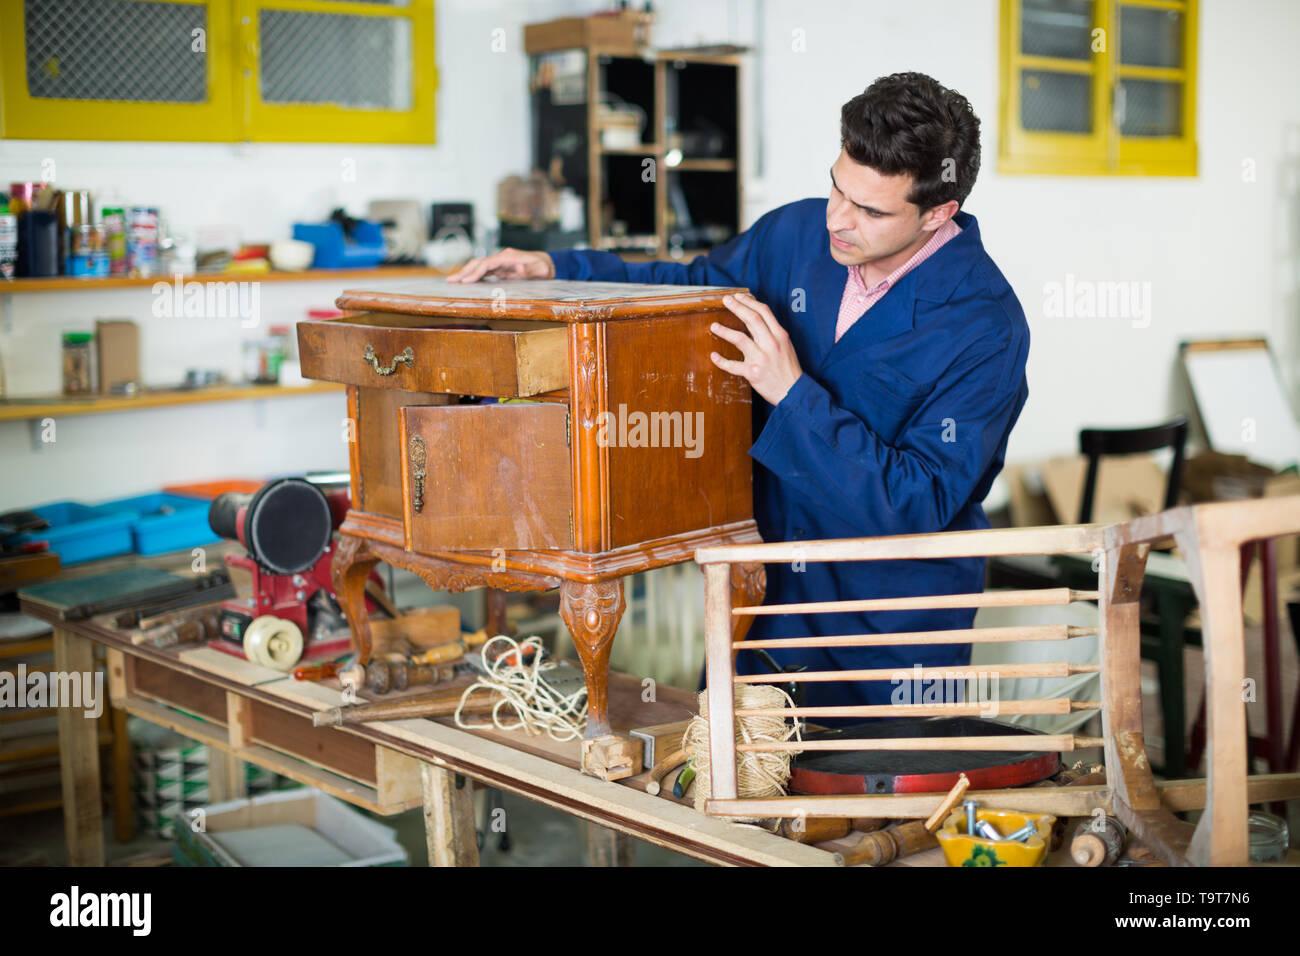 Adult craftsman inspecting old nightstand before restoration in workshop - Stock Image